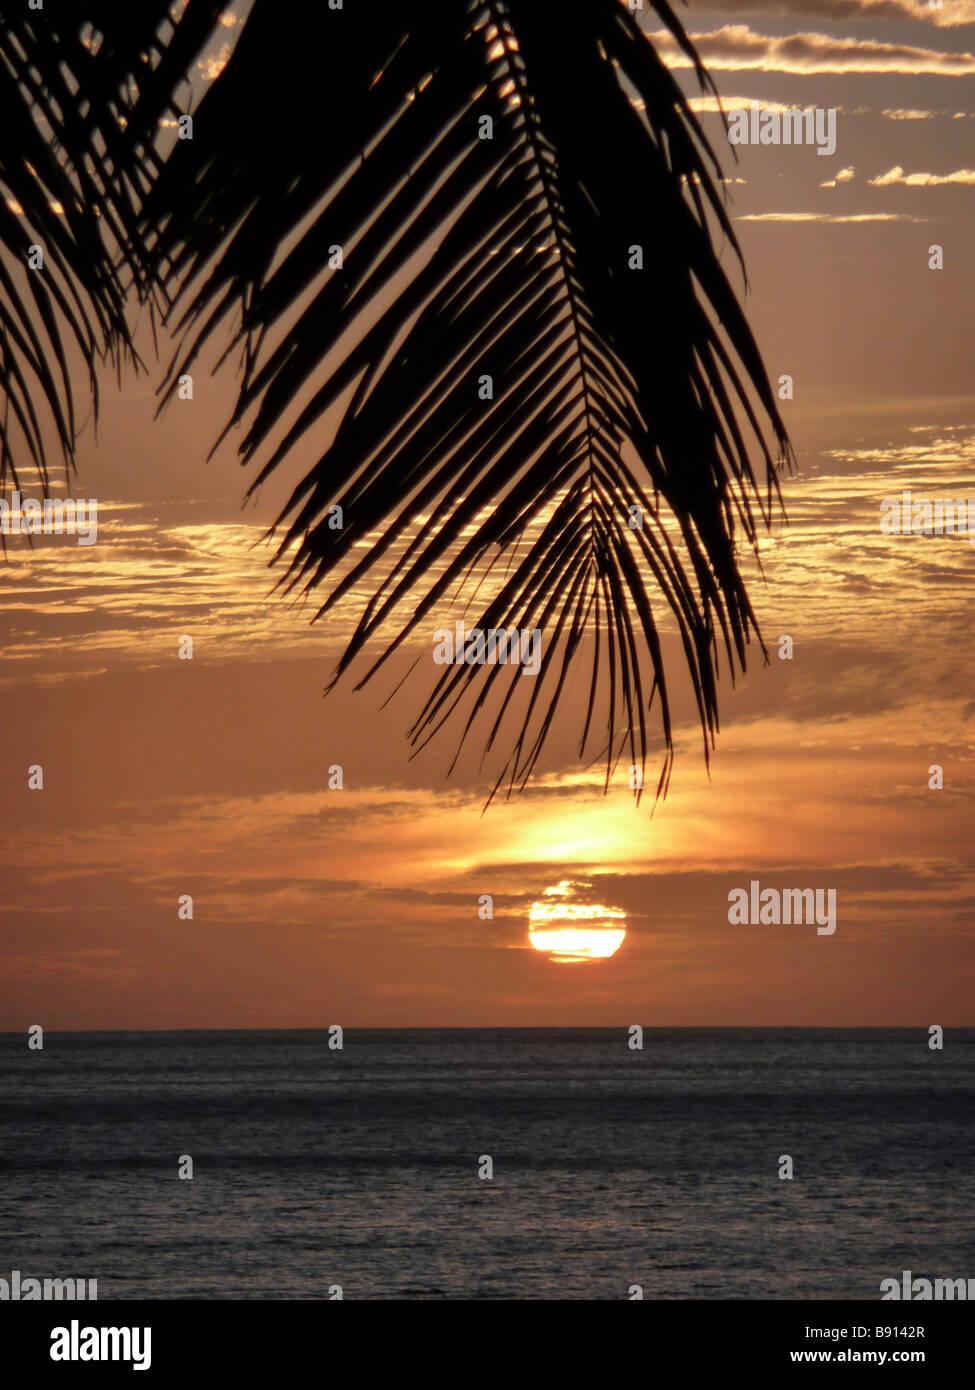 Palm Tree Sunset - Stock Image